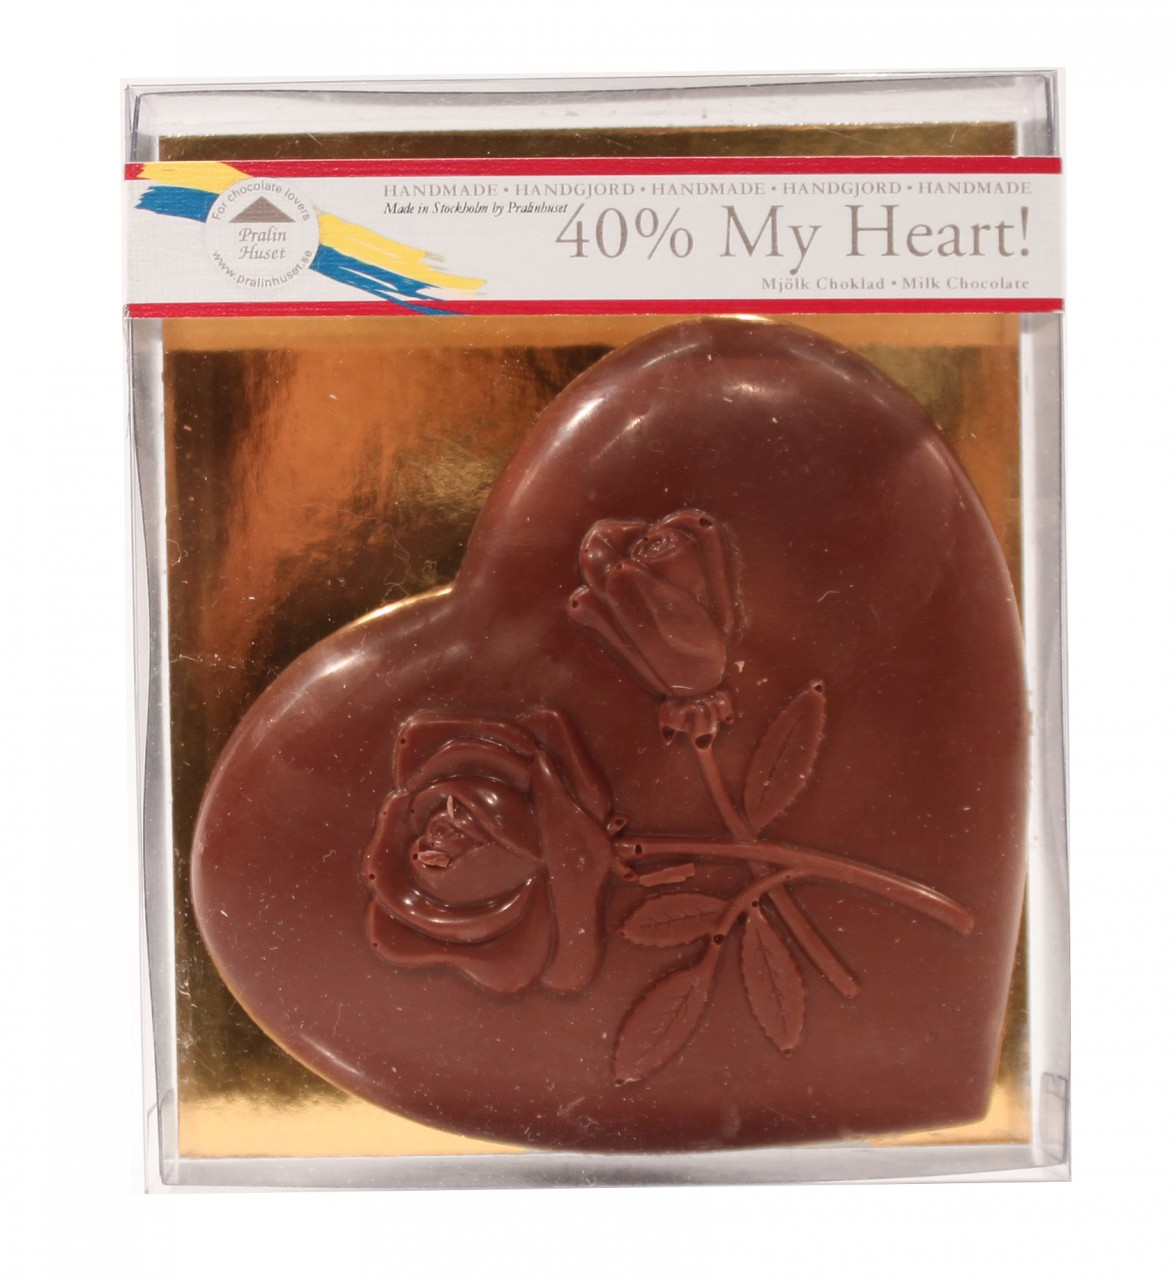 My Heart - 40%